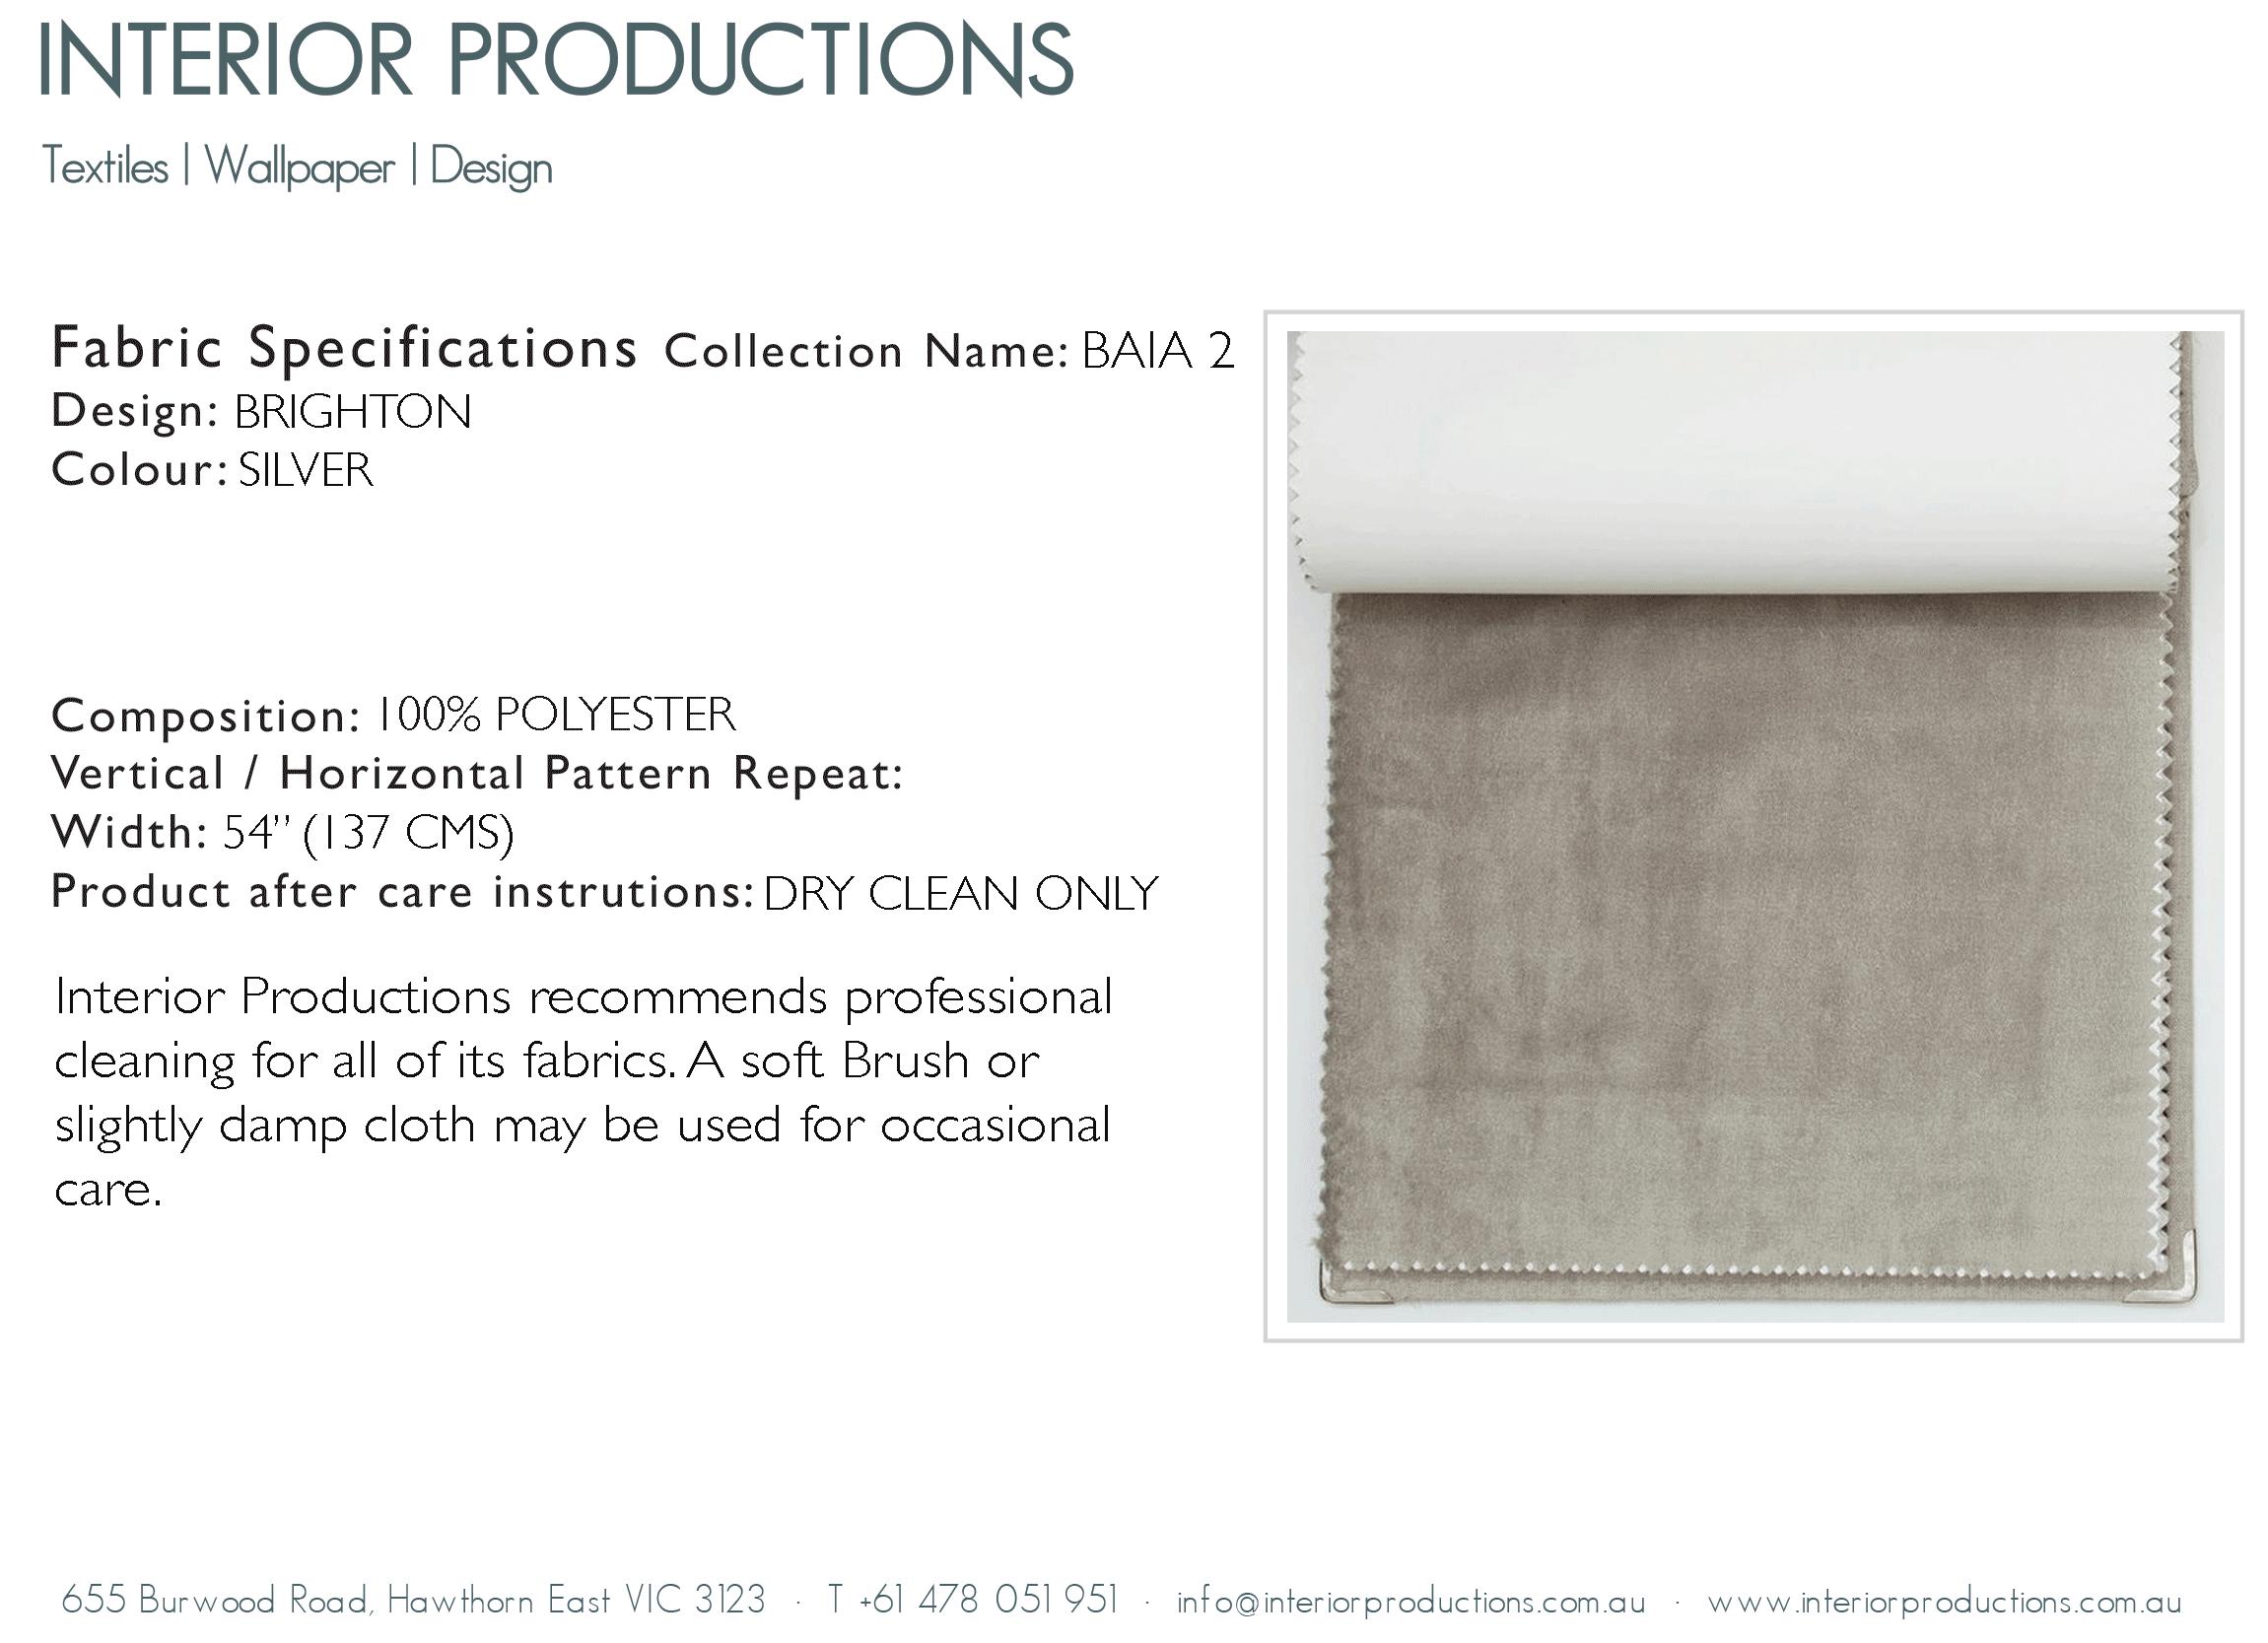 interior_productions_BRIGHTON---SILVER